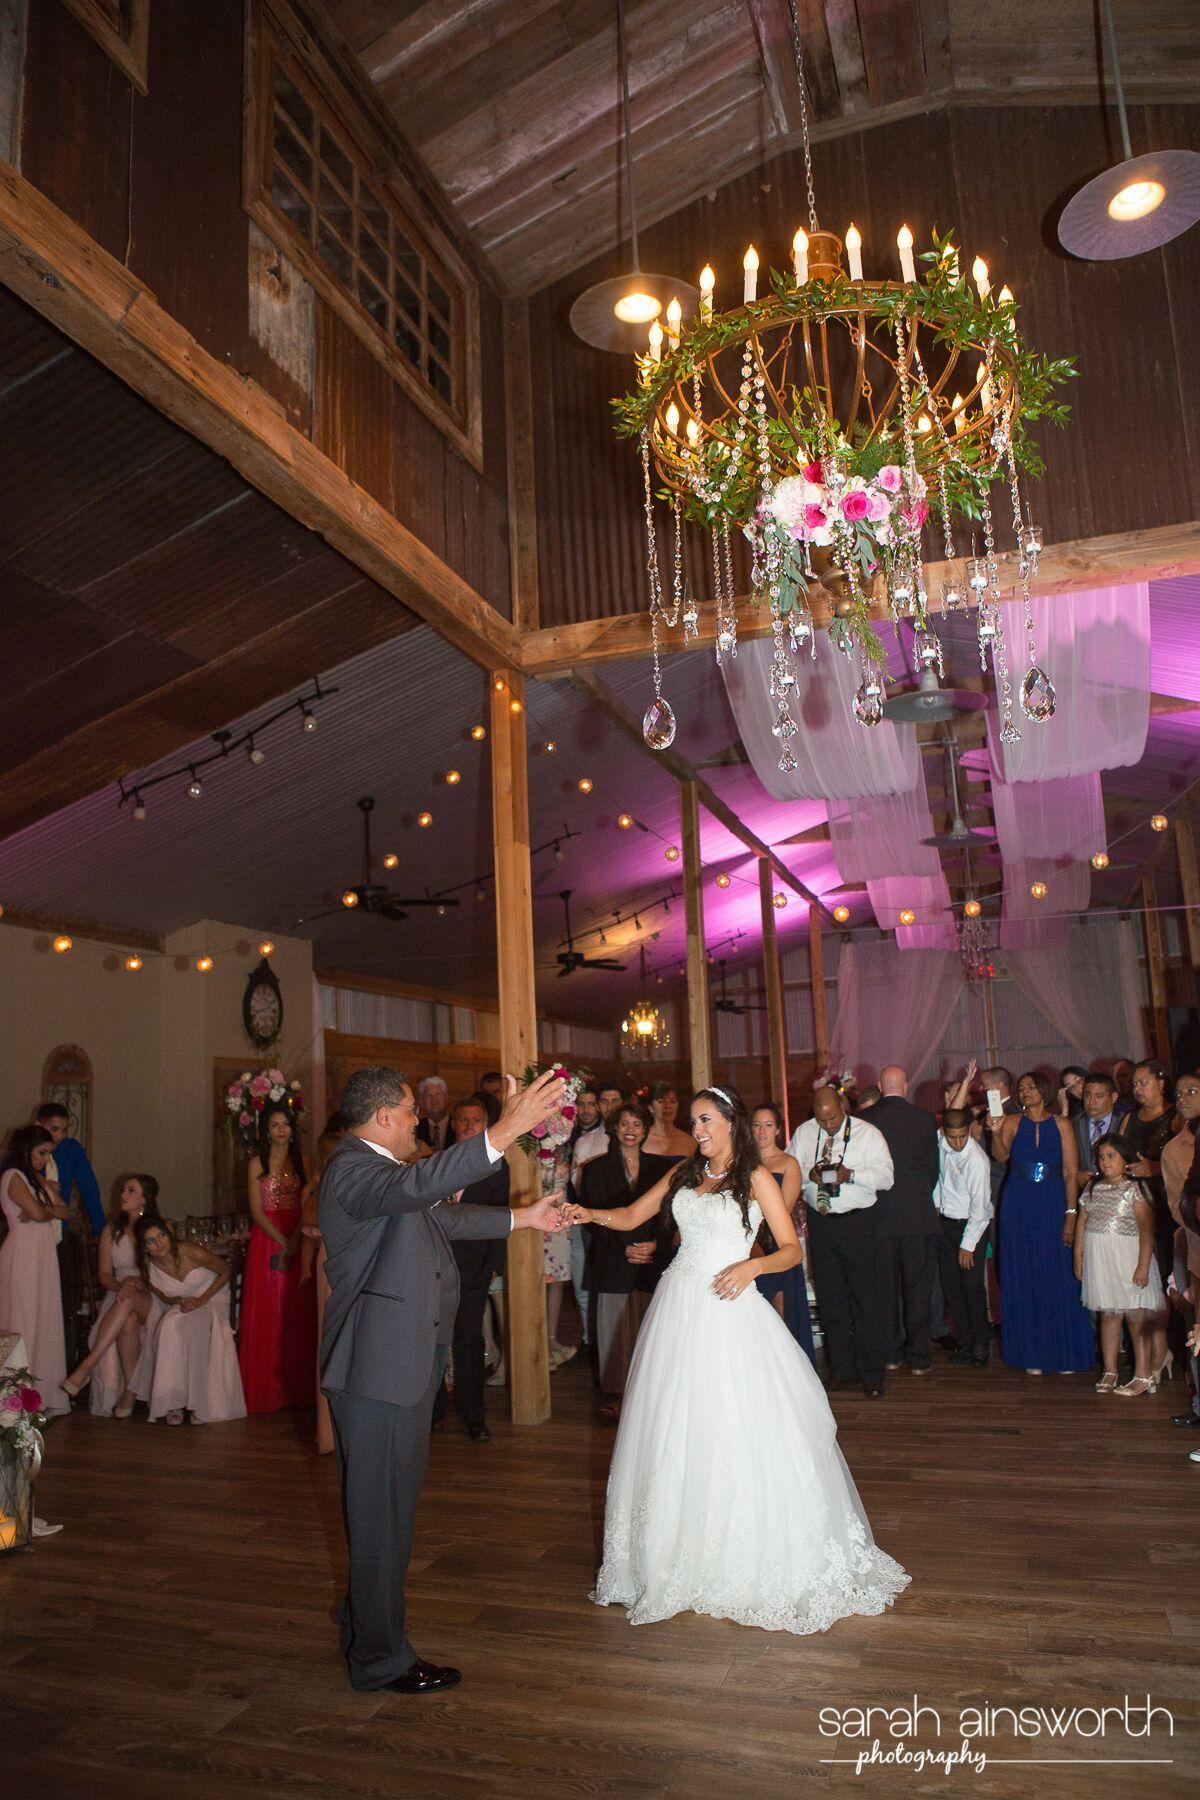 Rustic Barn Wedding Venues In Houston